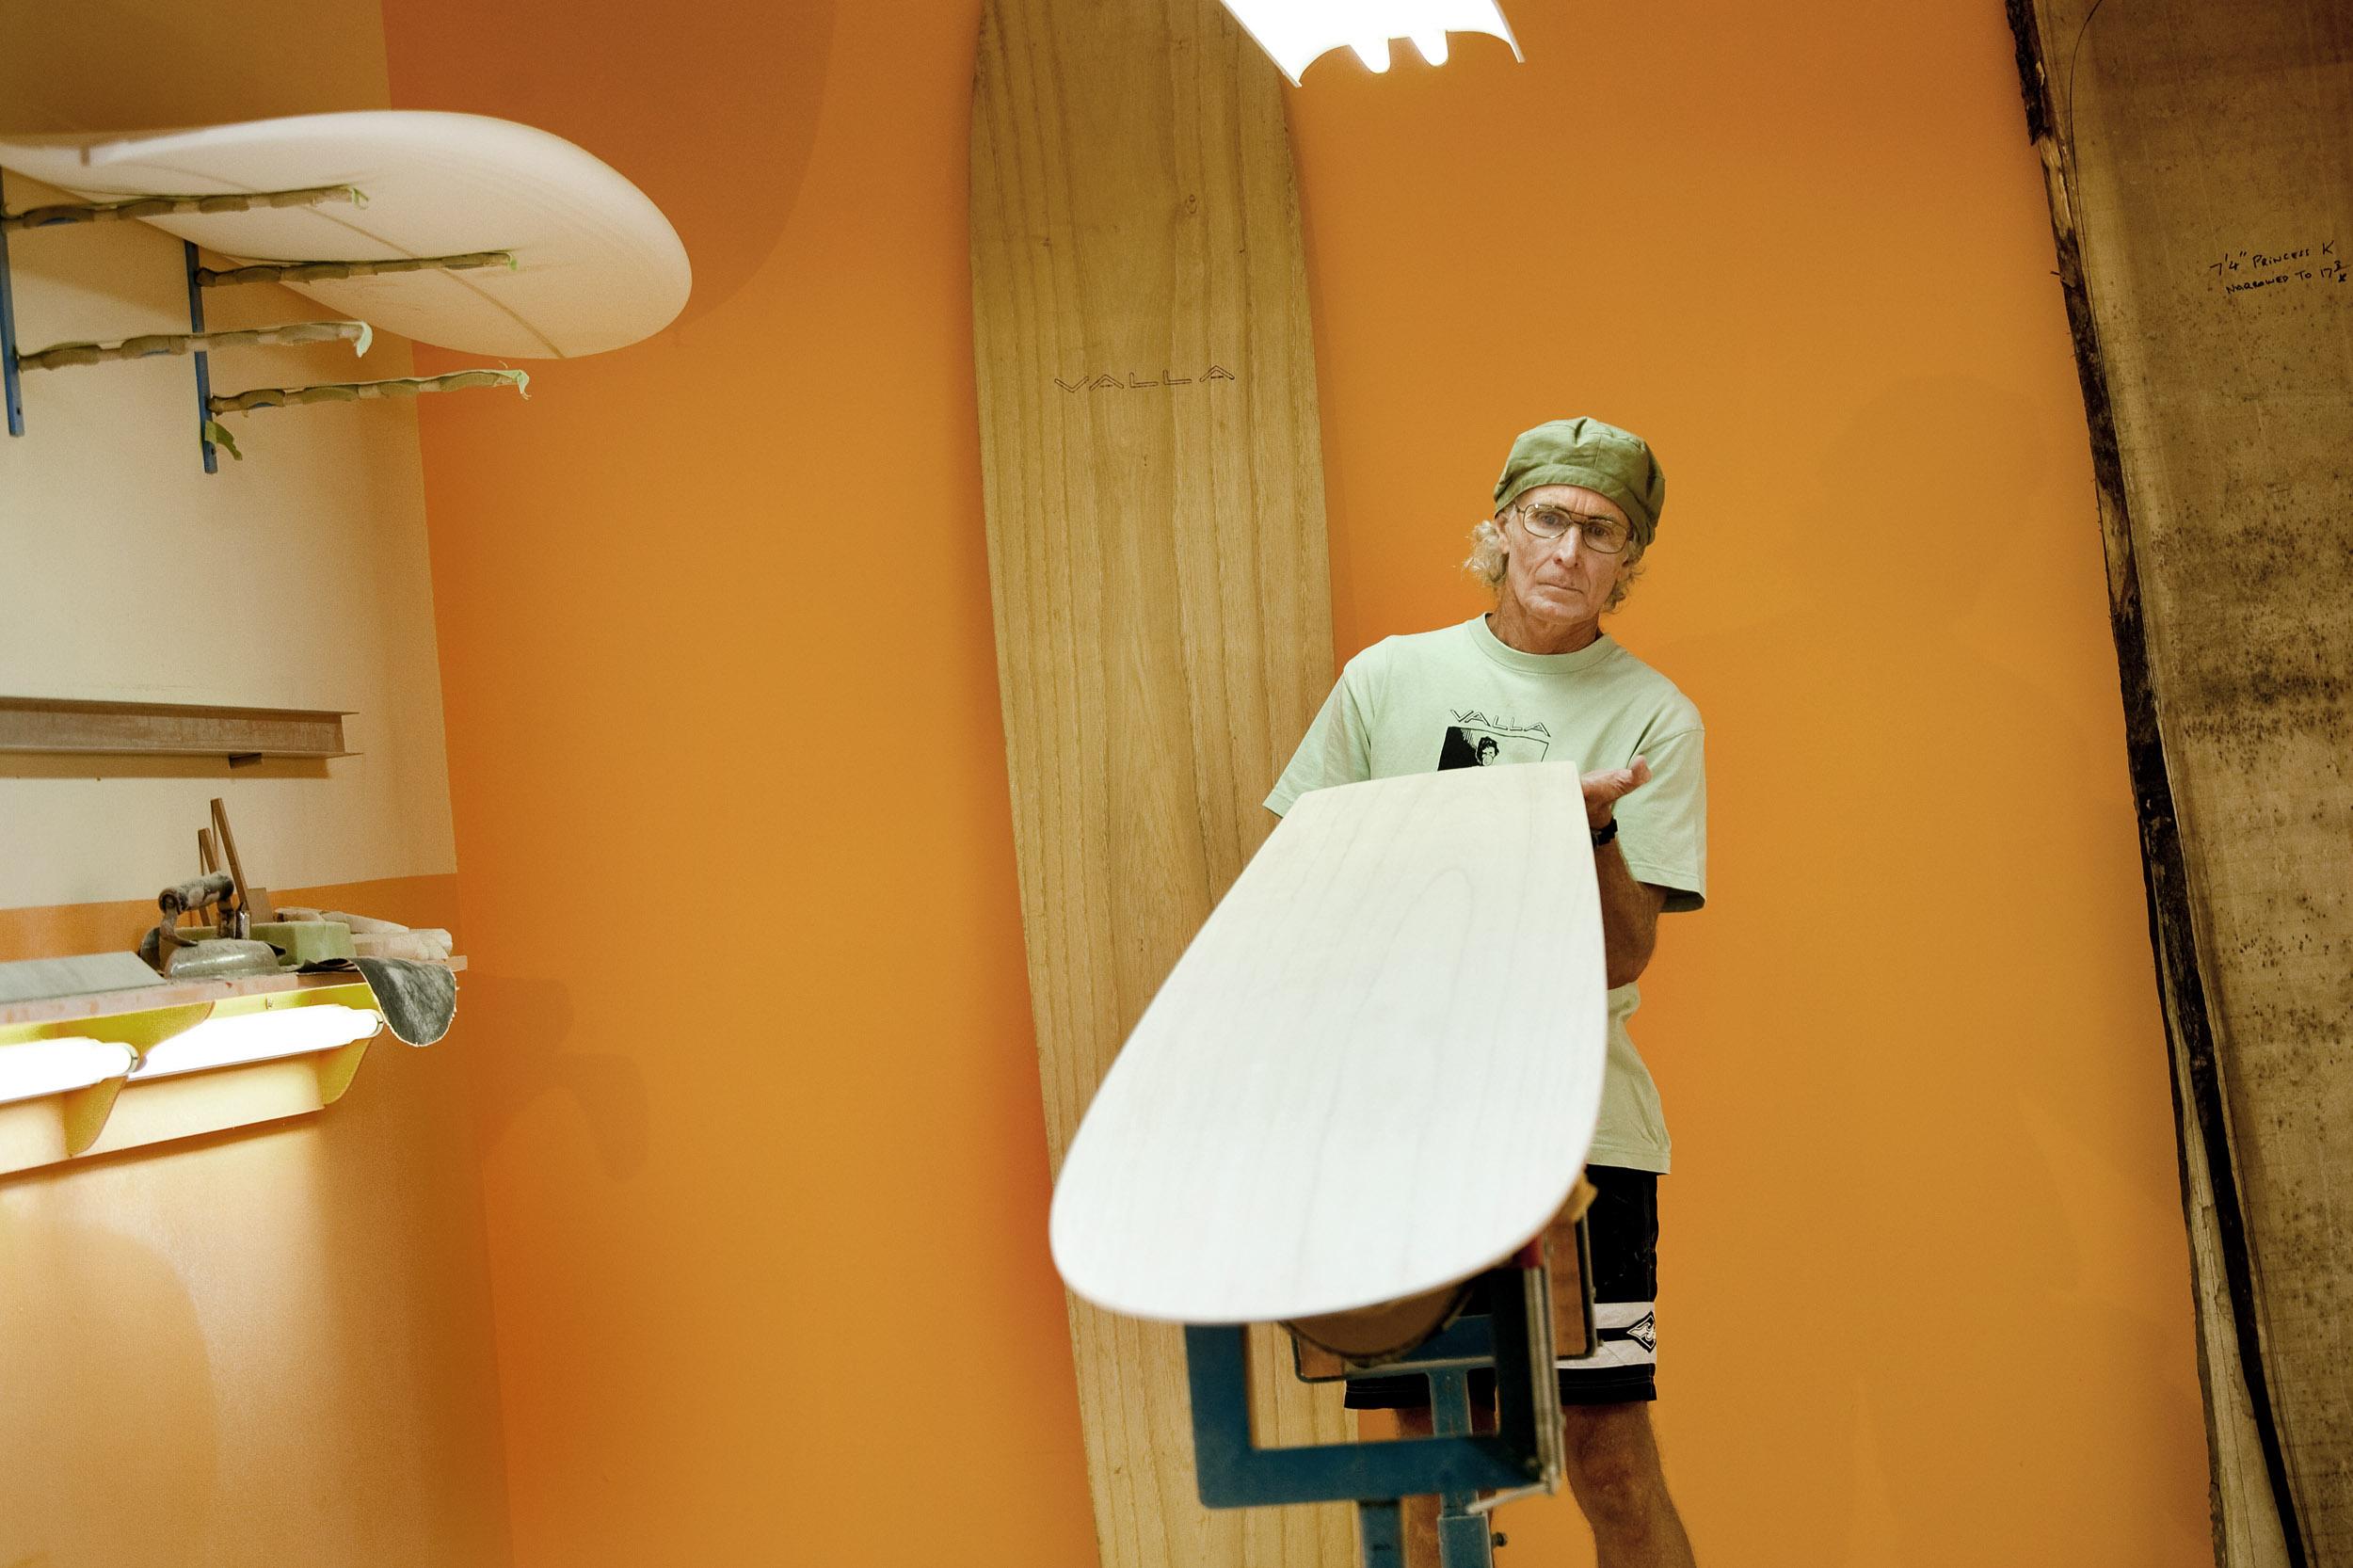 shaper-valla-surfboards-photography.jpg